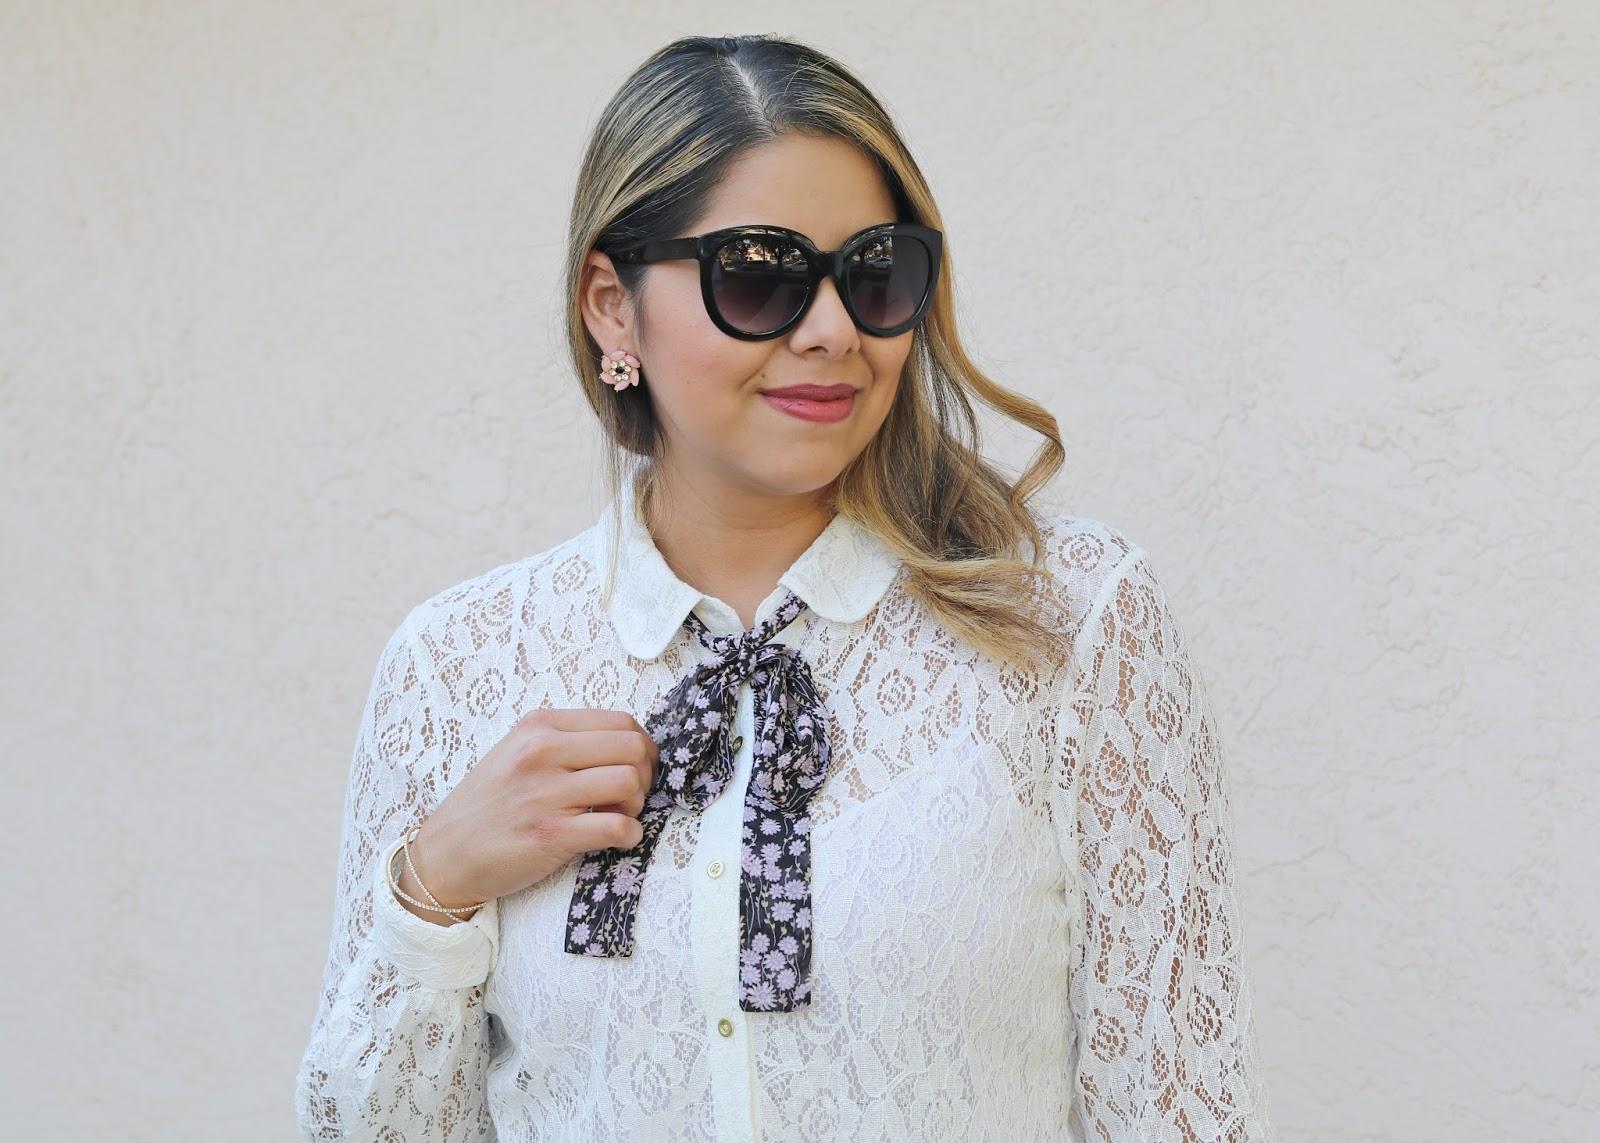 Latina fashion blogger, latina lifestyle blogger, latina fashion, lc kohls top, lace top with bow tie